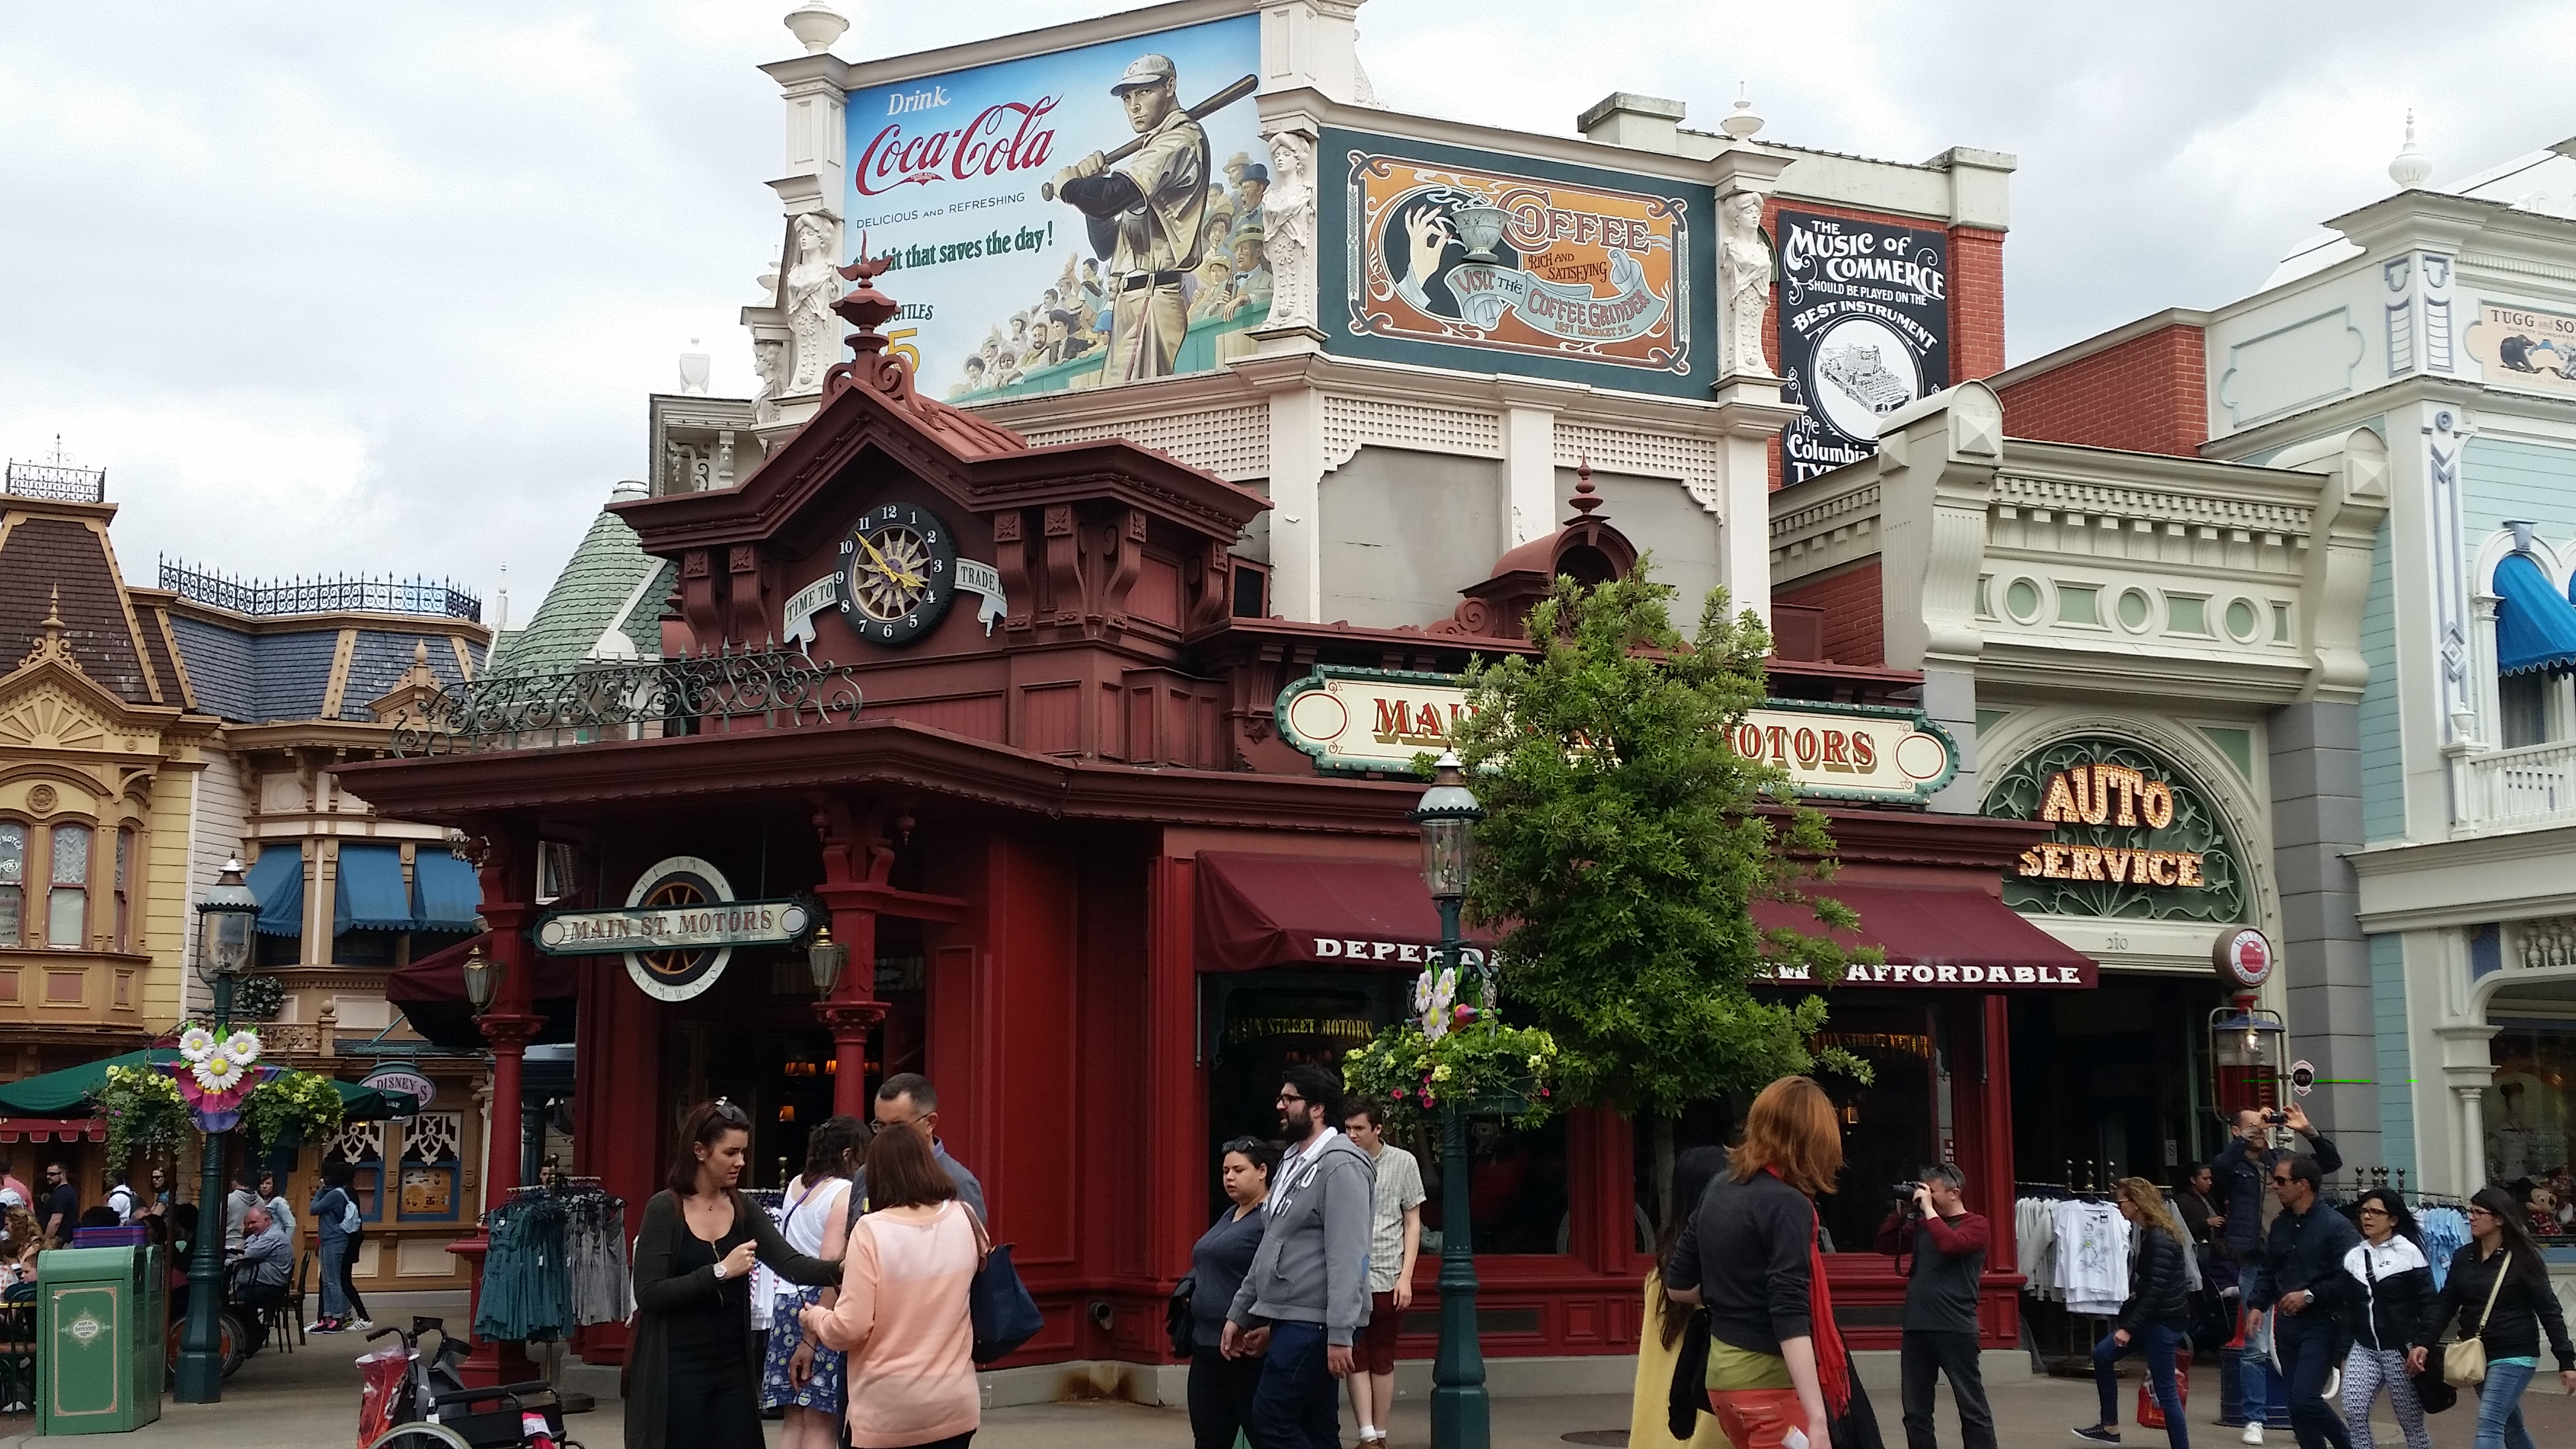 Main Street Motors Disneyland Paris Dani 39 S Decadent Deals